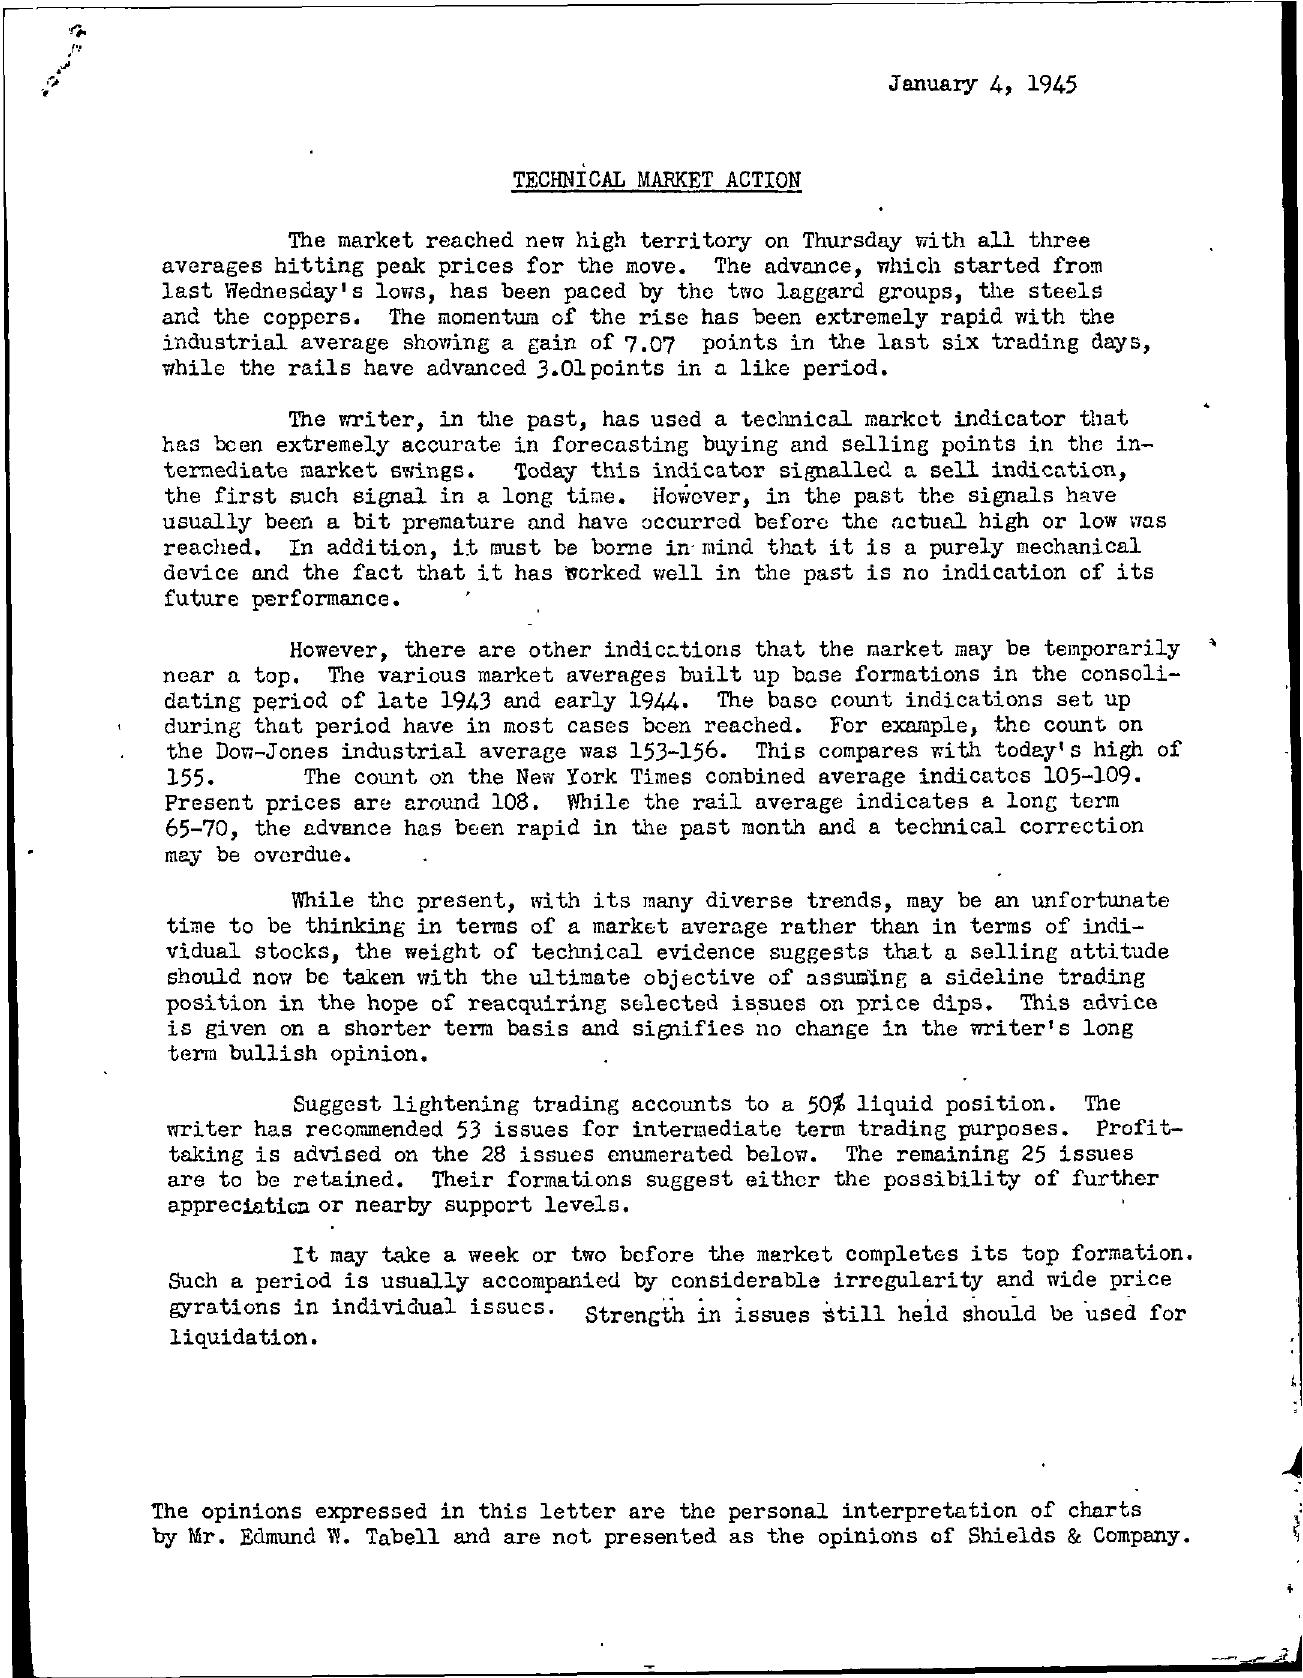 Tabell's Market Letter - January 04, 1945